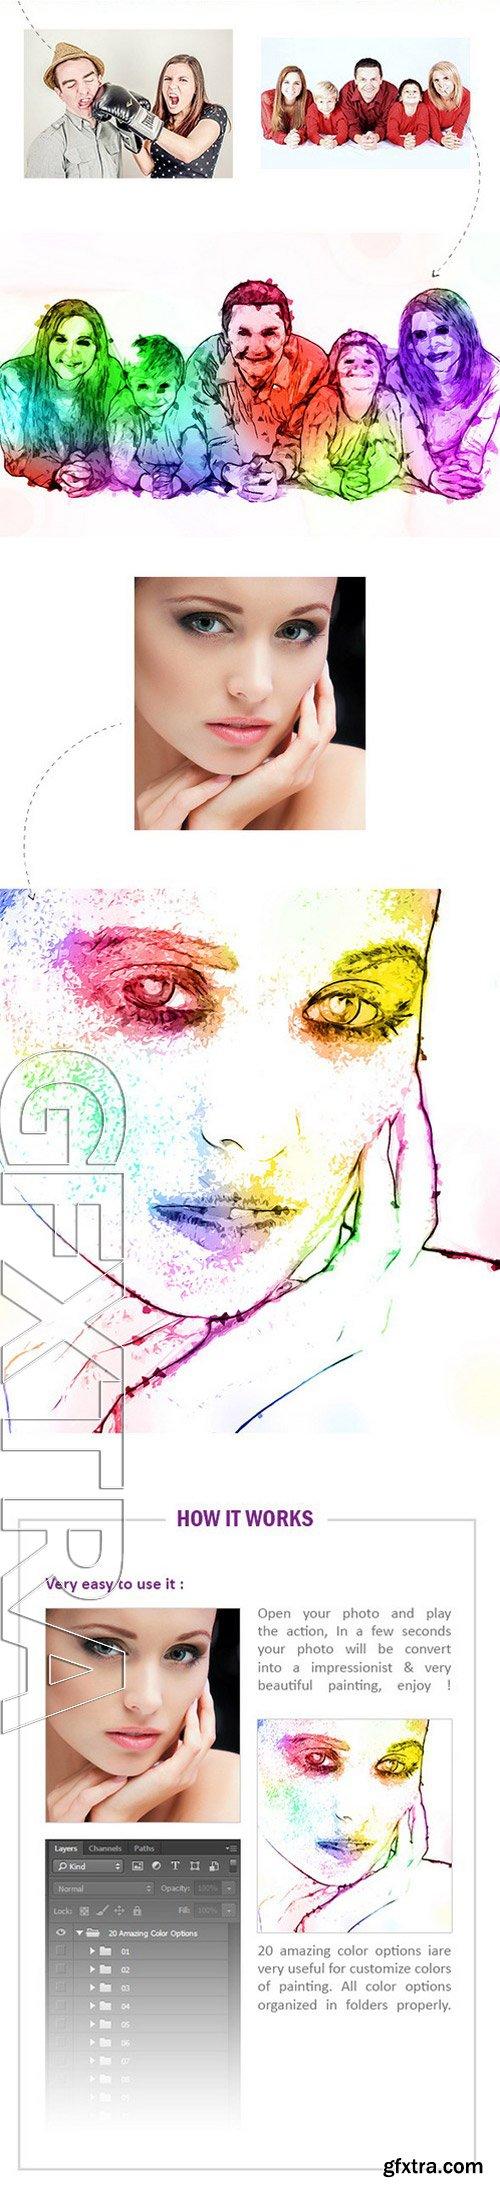 GraphicRiver - Smart Painting Vol.1 - Photoshop Action 11459711